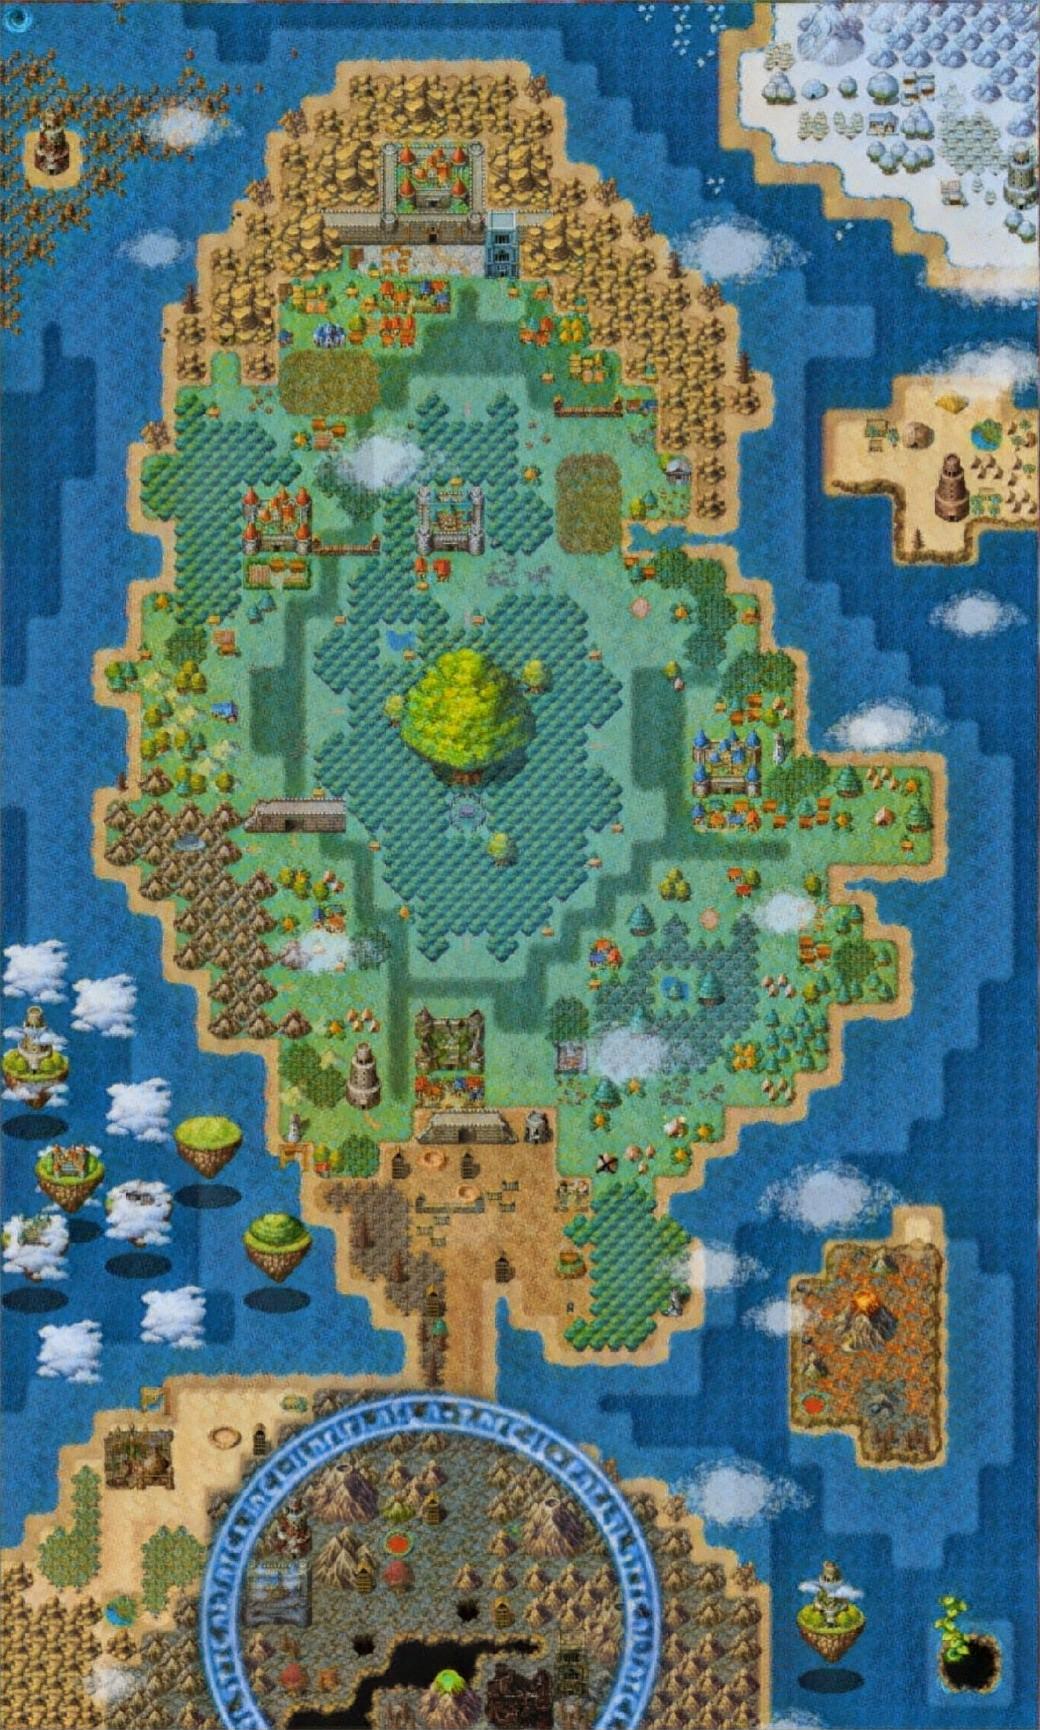 Worldmap III